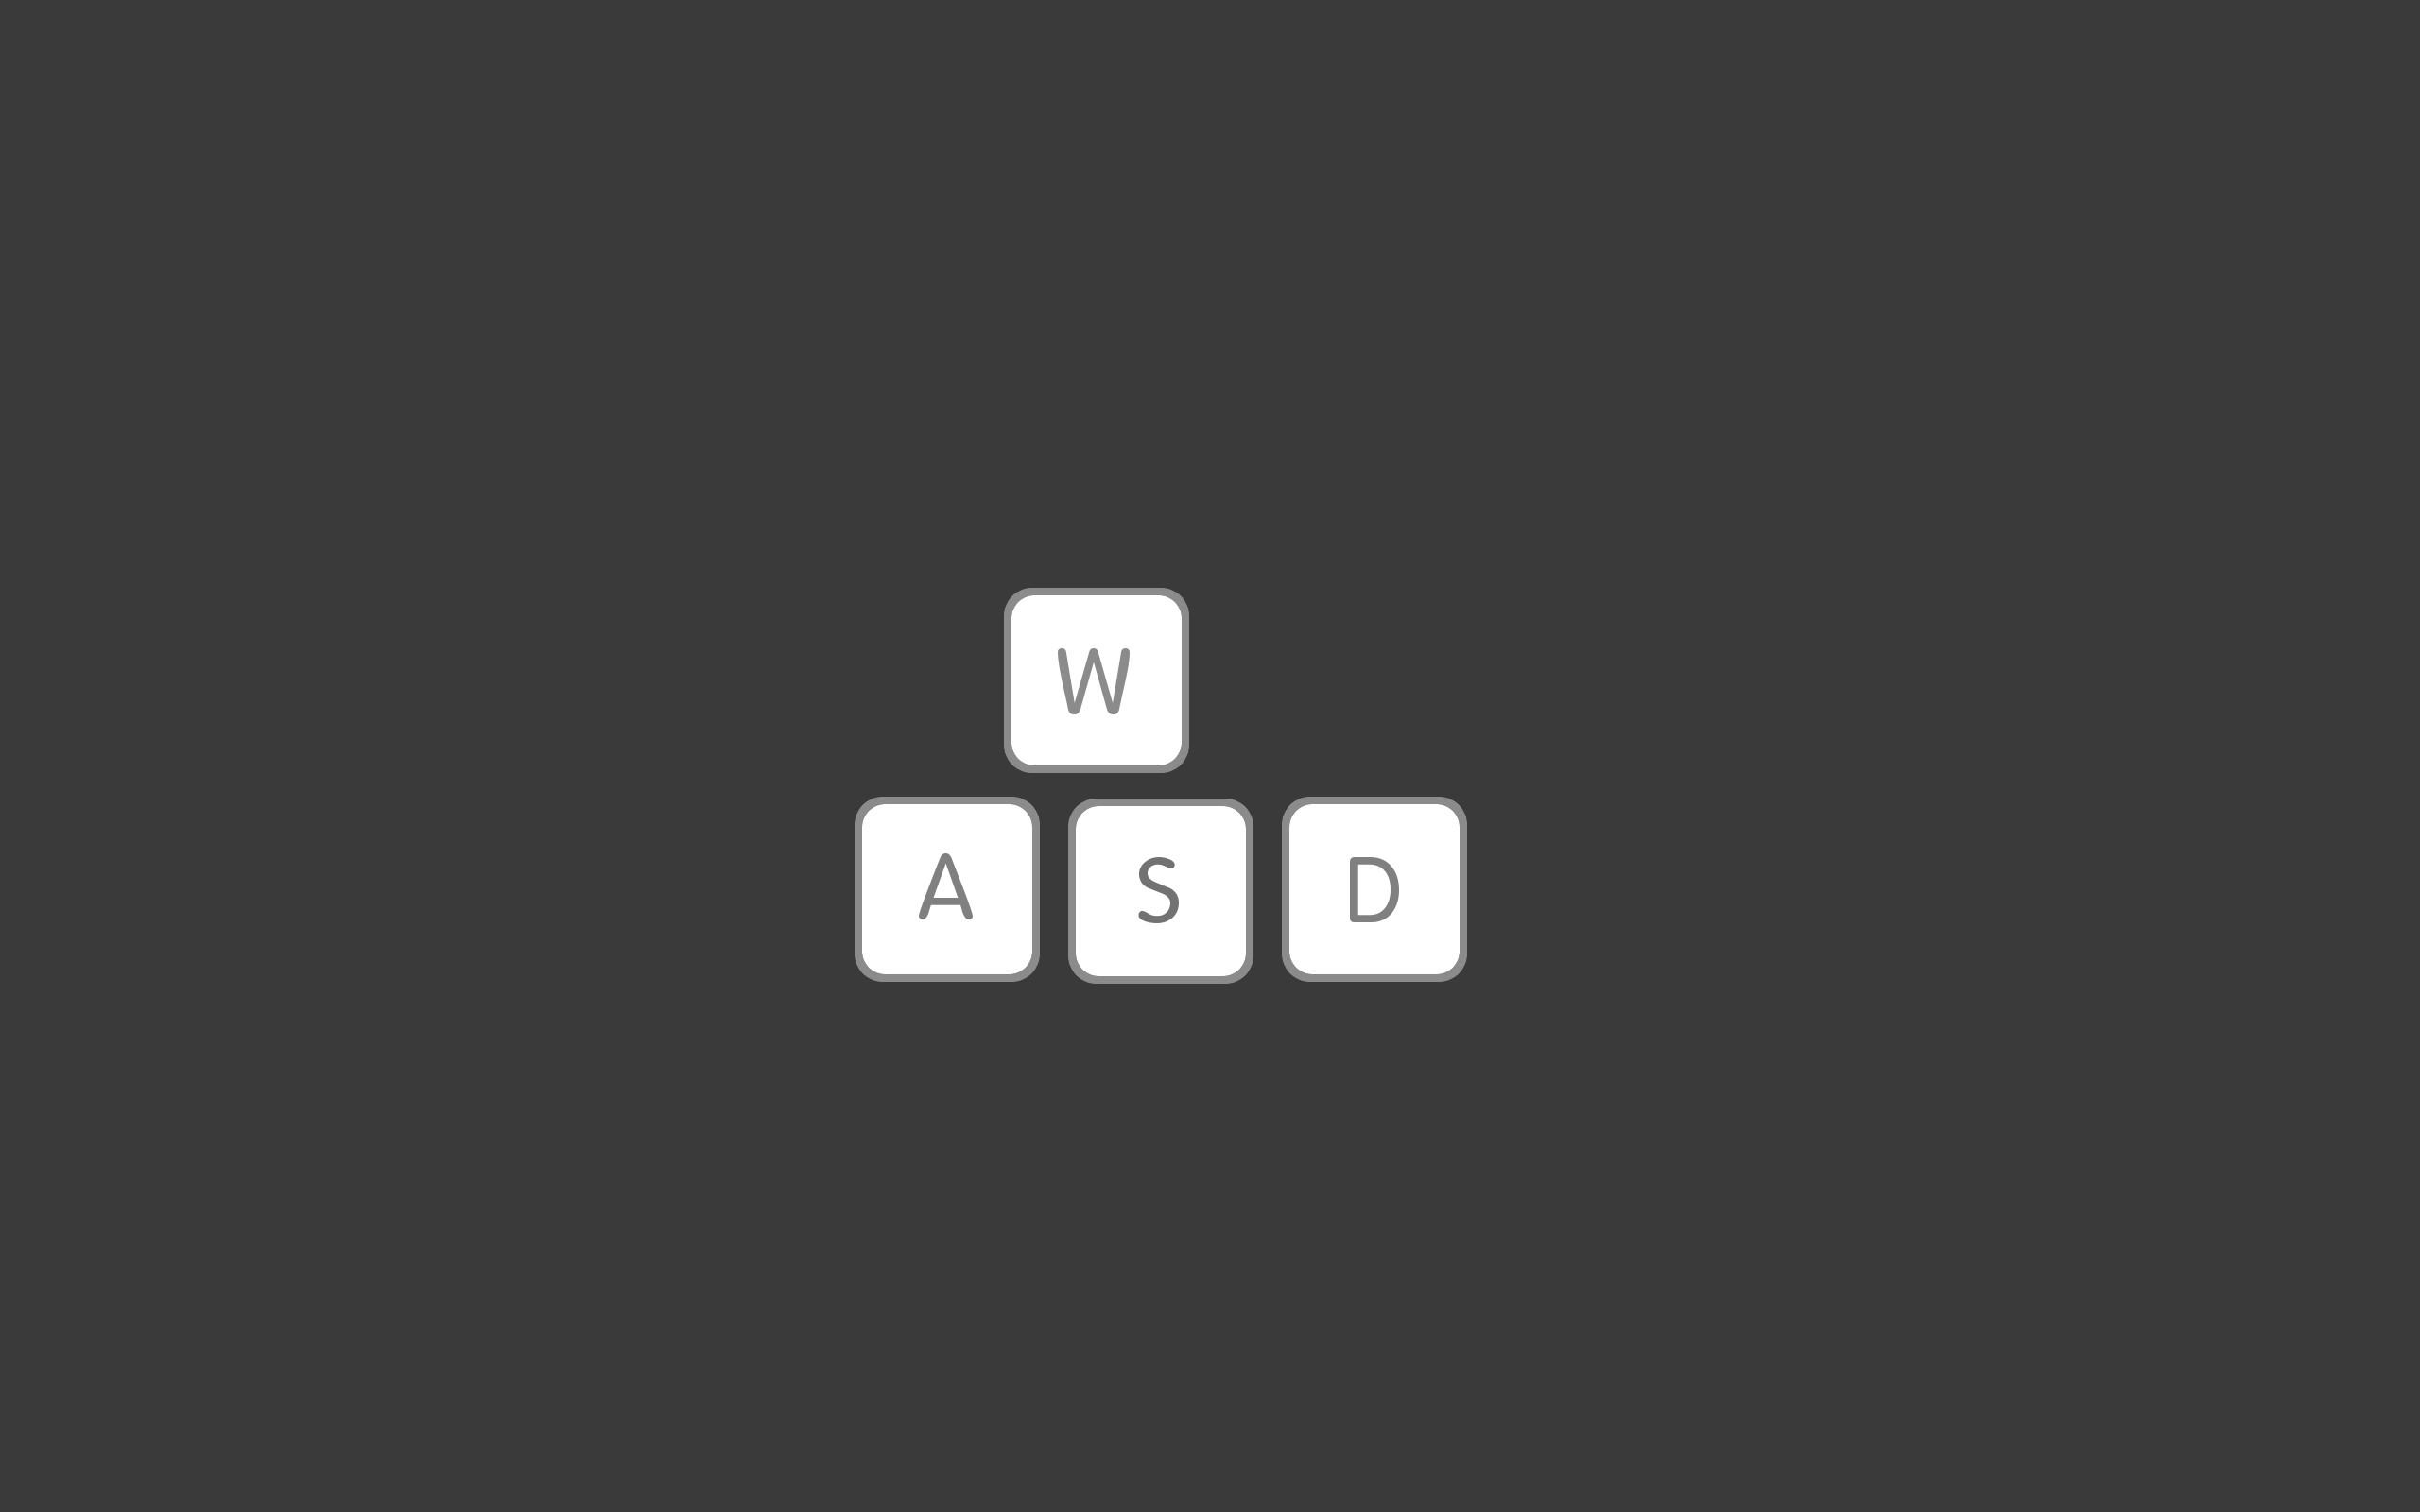 Video games minimalistic mac gray keyboards gaming pc games wallpaper .